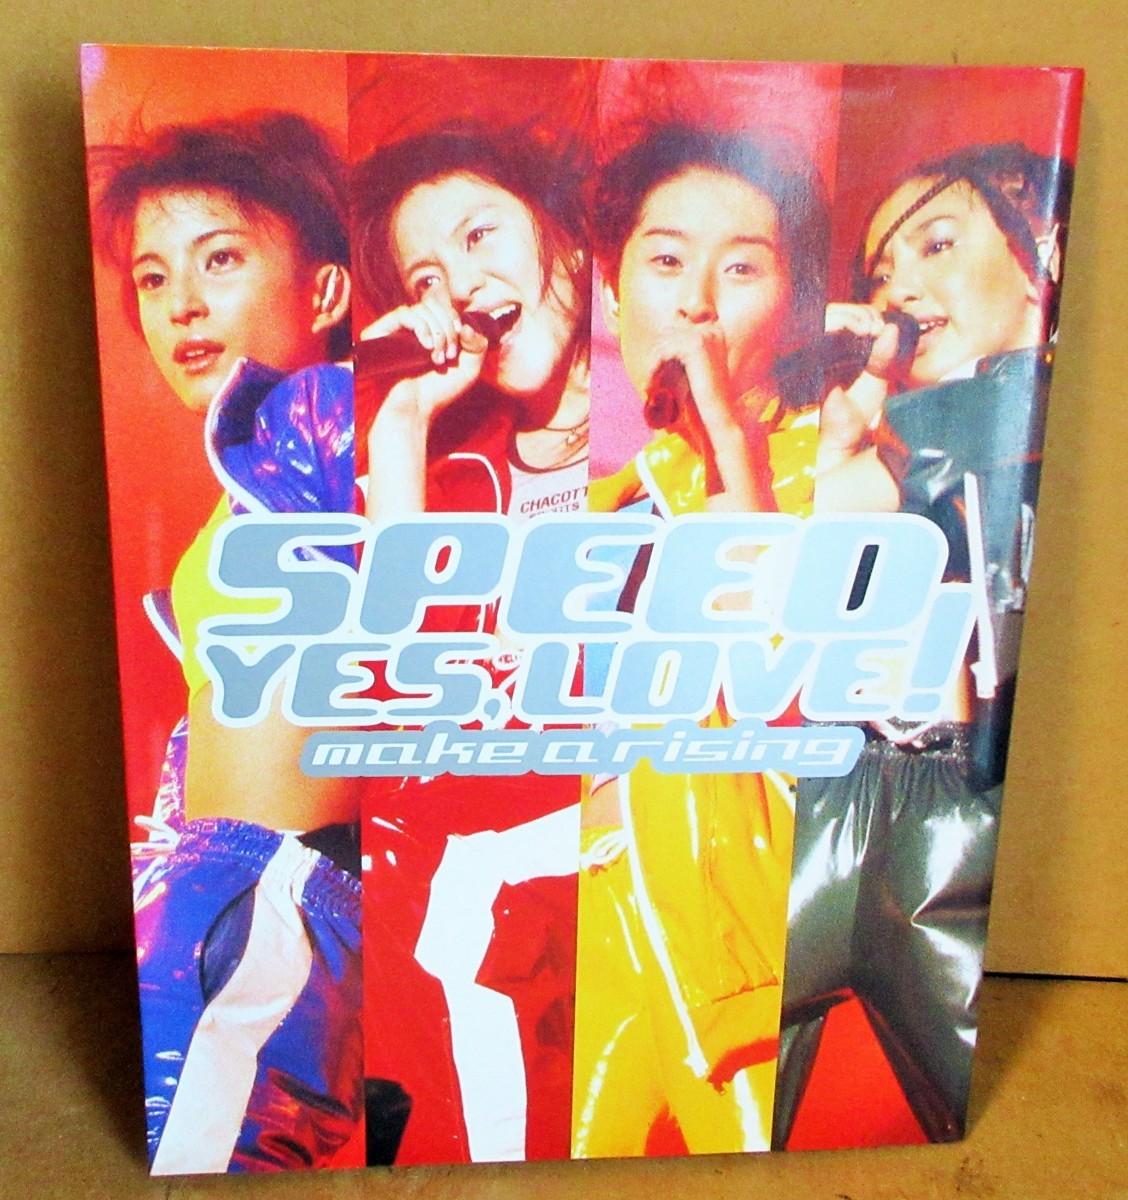 ☆ SPEED 写真集 YES,LOVE! make a rising◆シール、ポスター付き291円_画像6